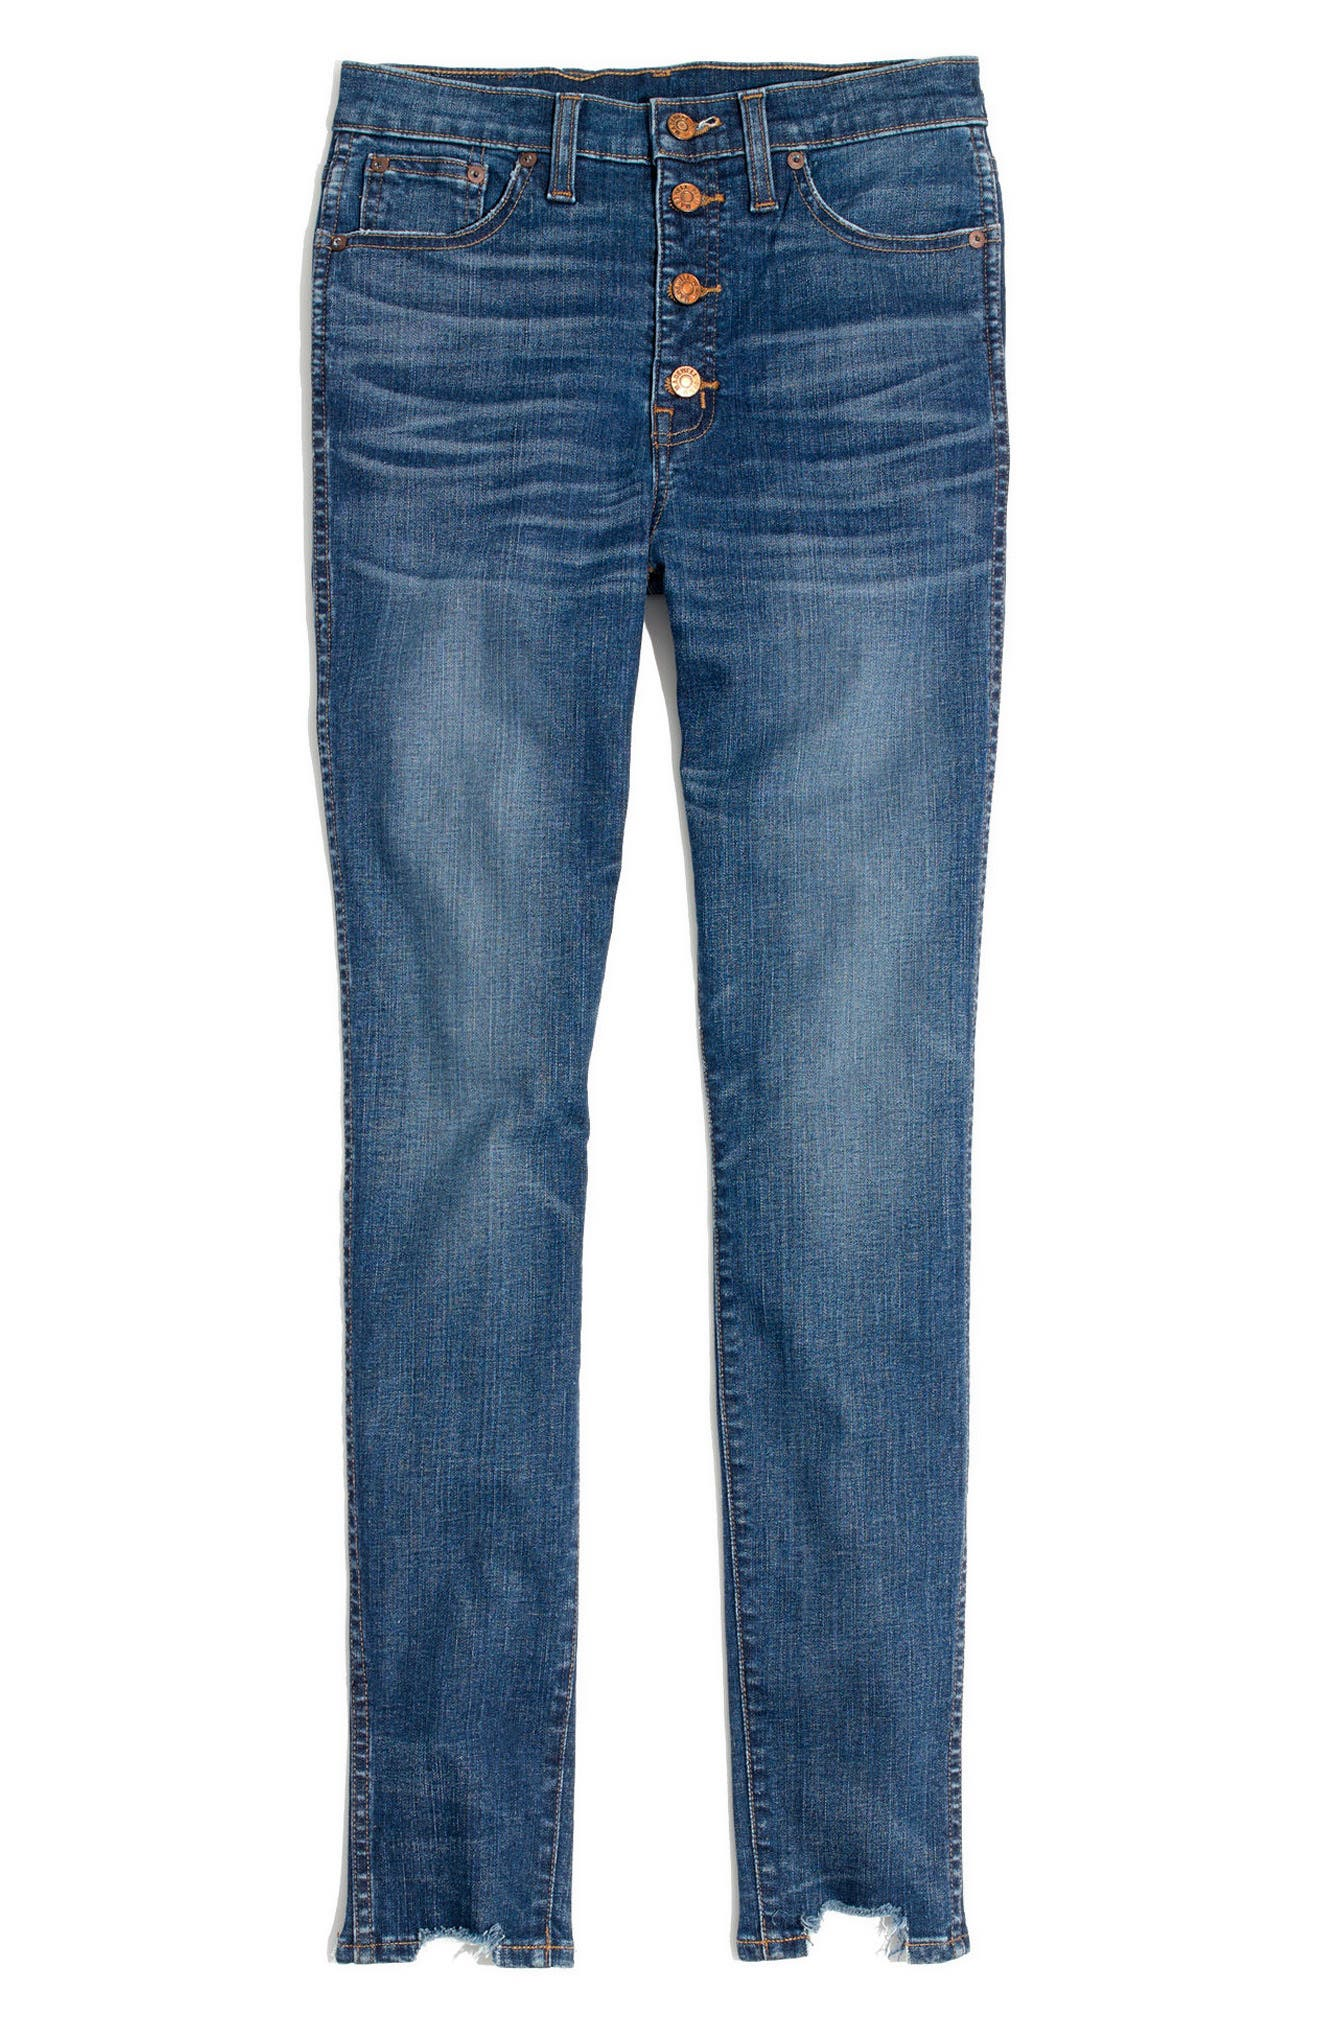 10-Inch Chewed Hem Skinny Jeans,                             Alternate thumbnail 4, color,                             Copeland